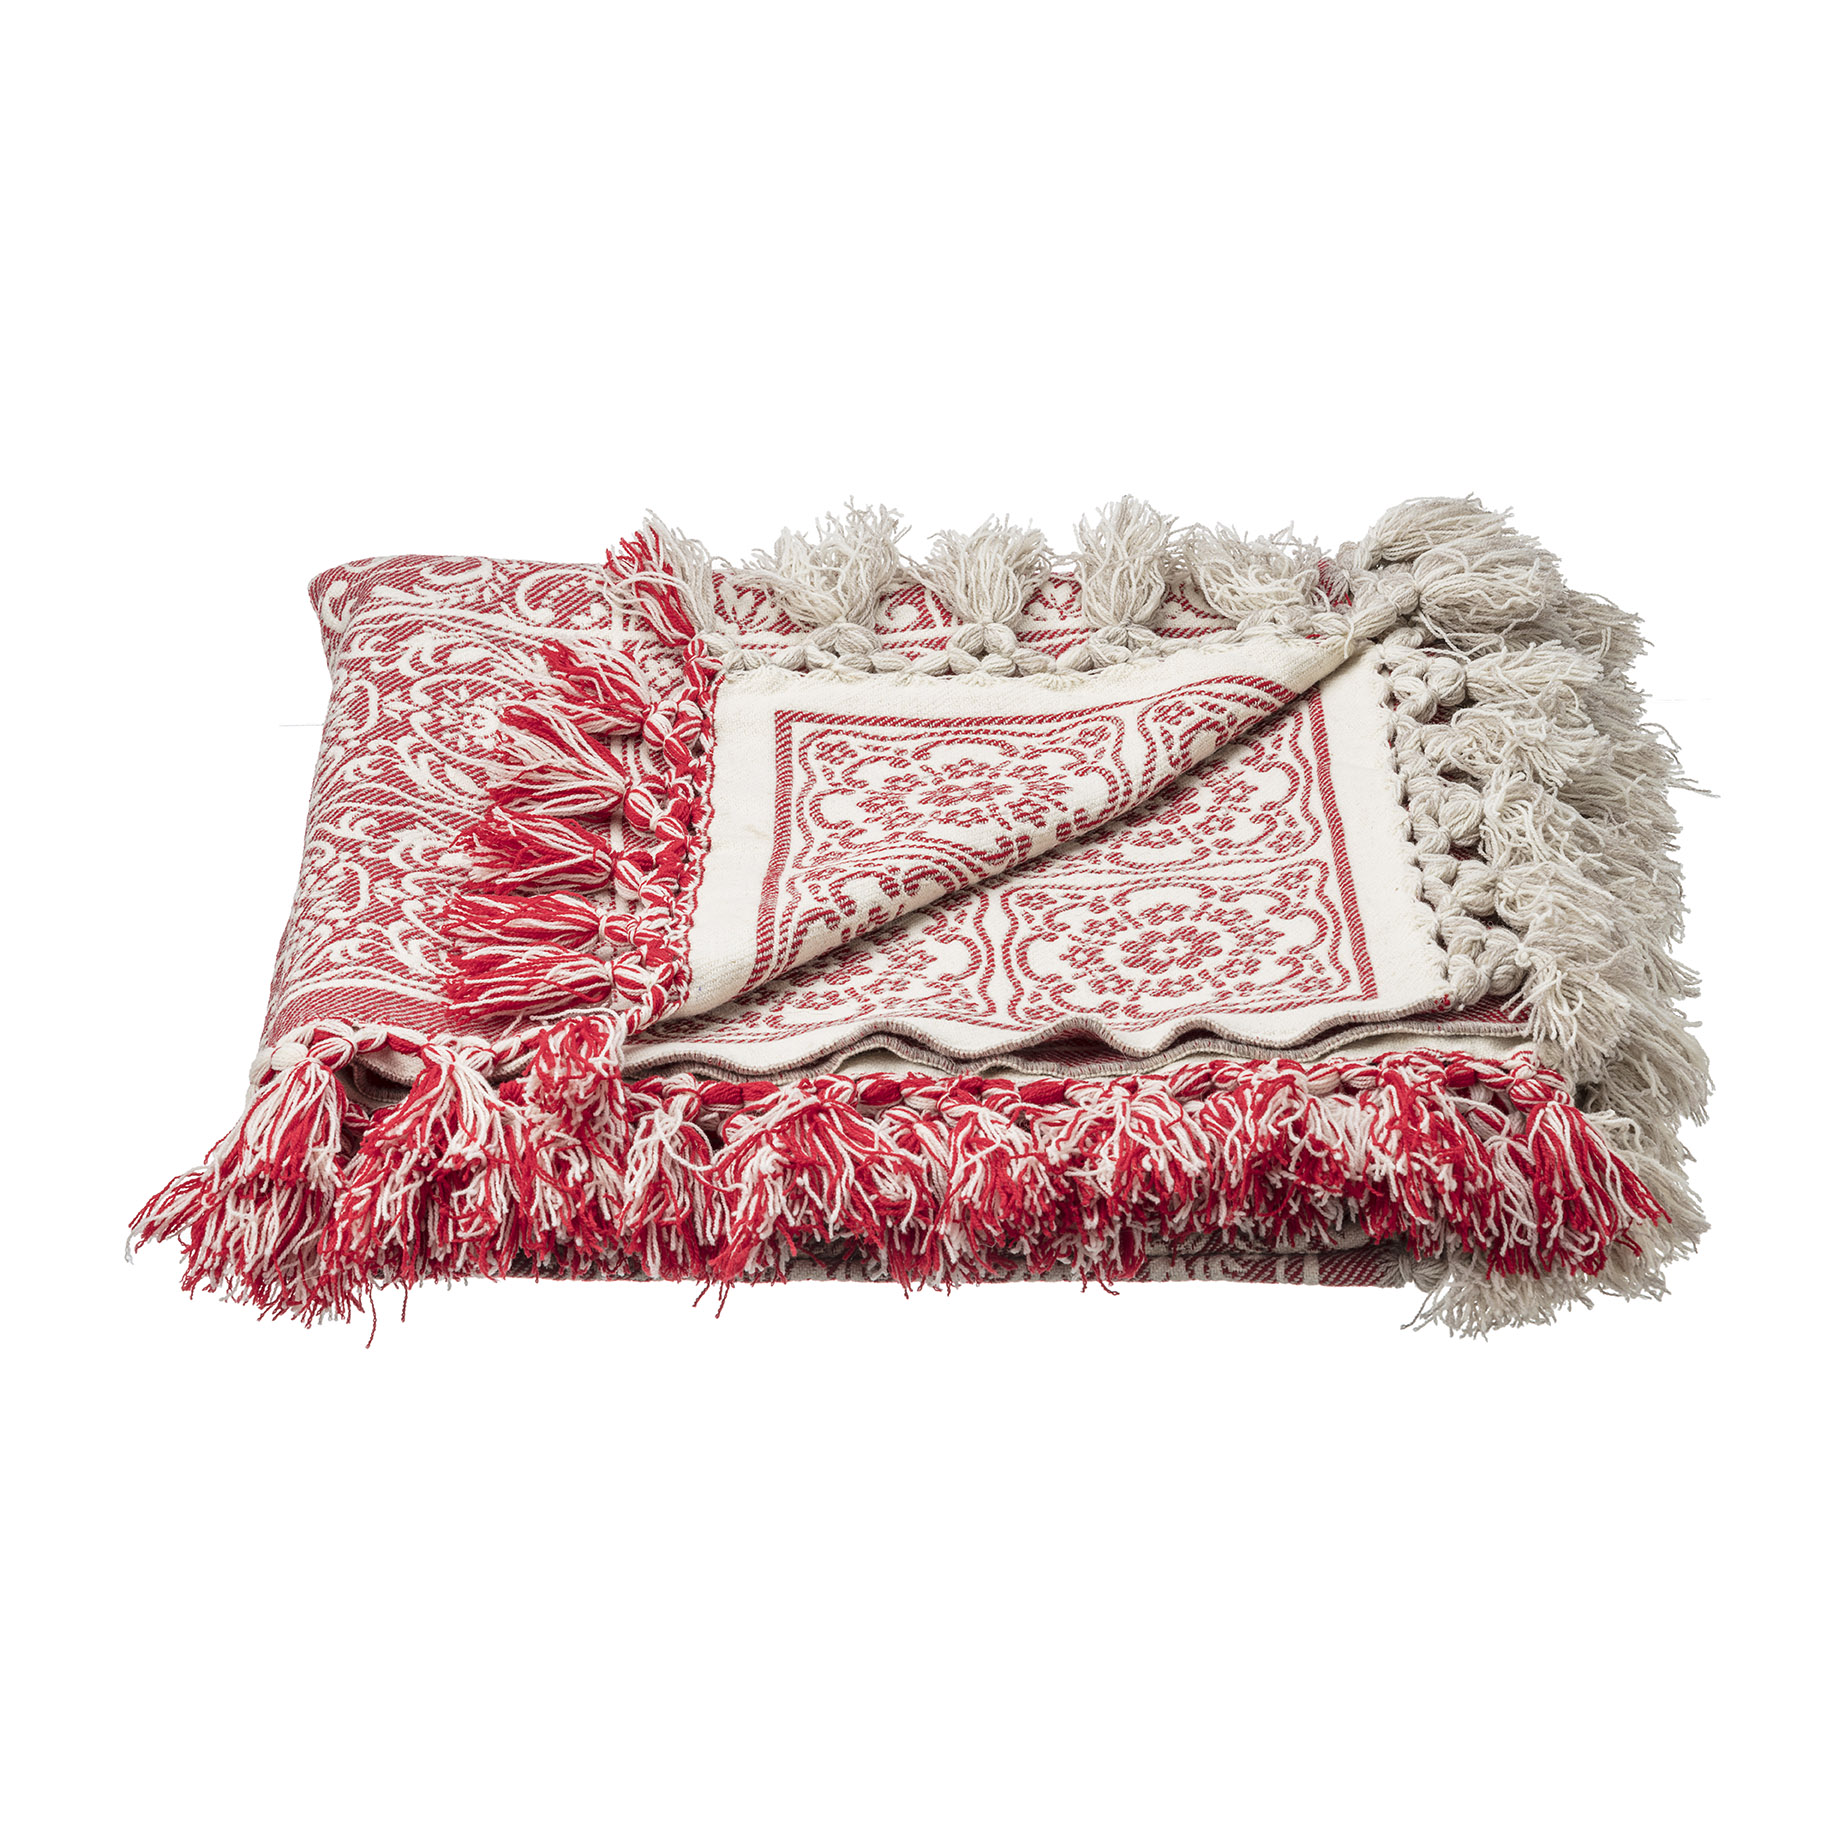 La coperta abruzzese Taranta Peligna